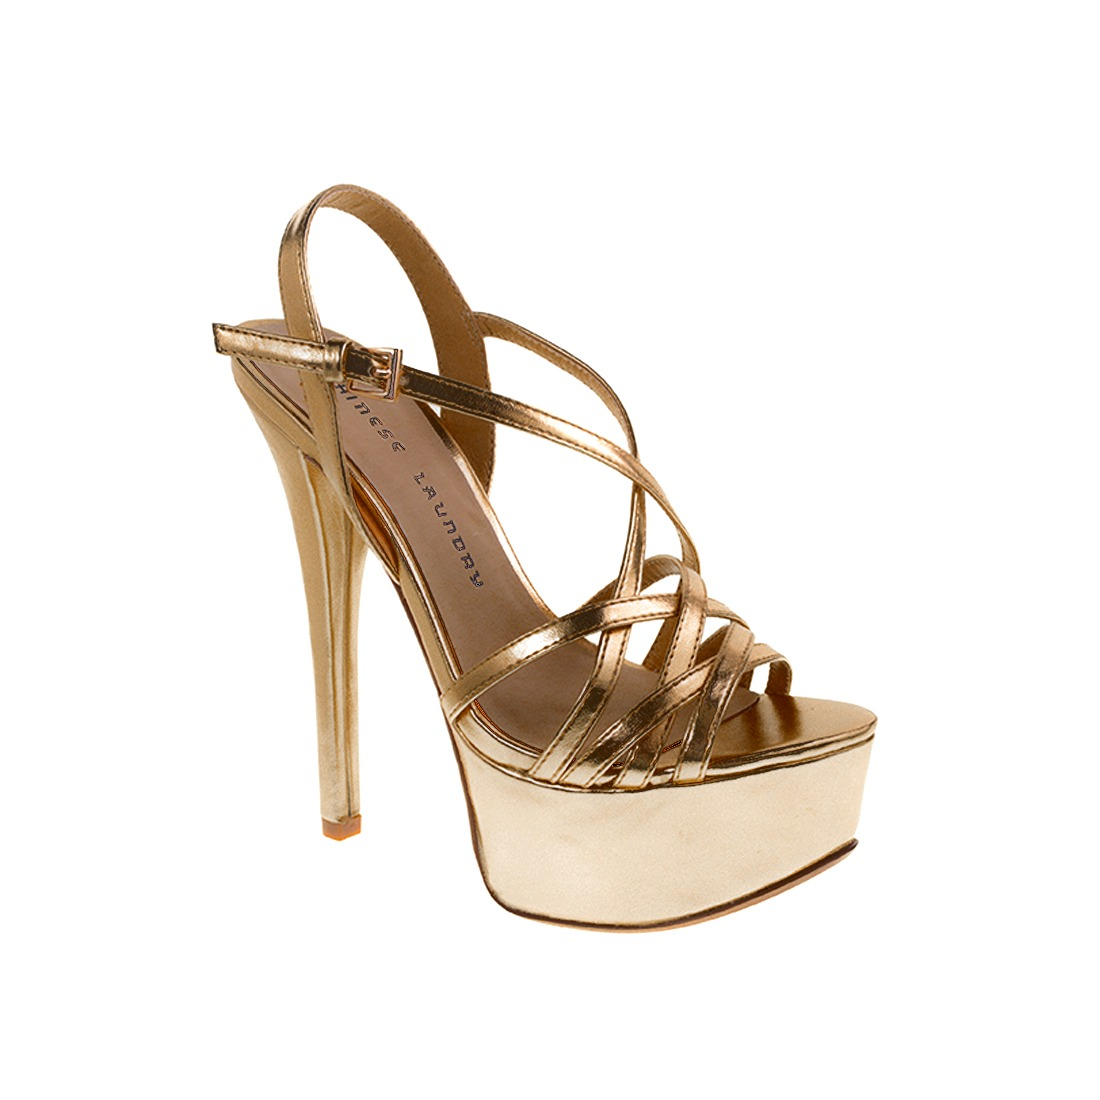 d196599dd66 zapato dama sandalia teaser dorado hells chinese laundry. Cargando zoom.